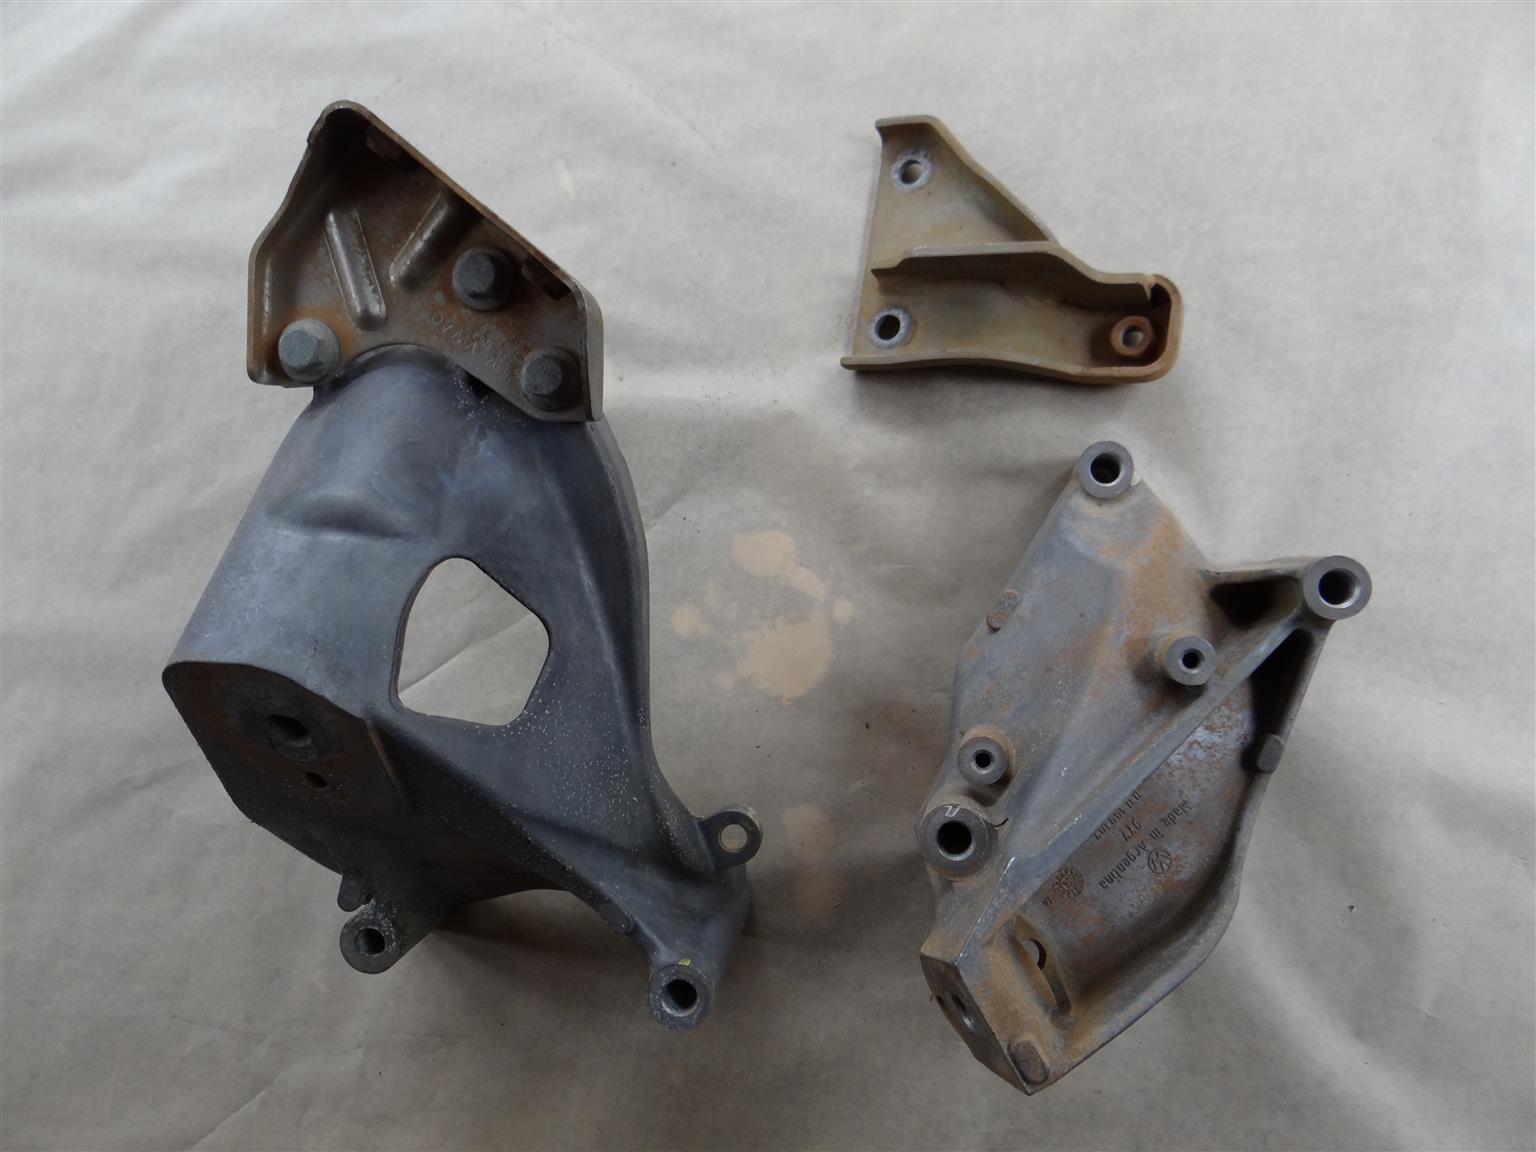 Engine  support brackets - VW Amarok / Transporter / Audi / VW 2.0 TDI